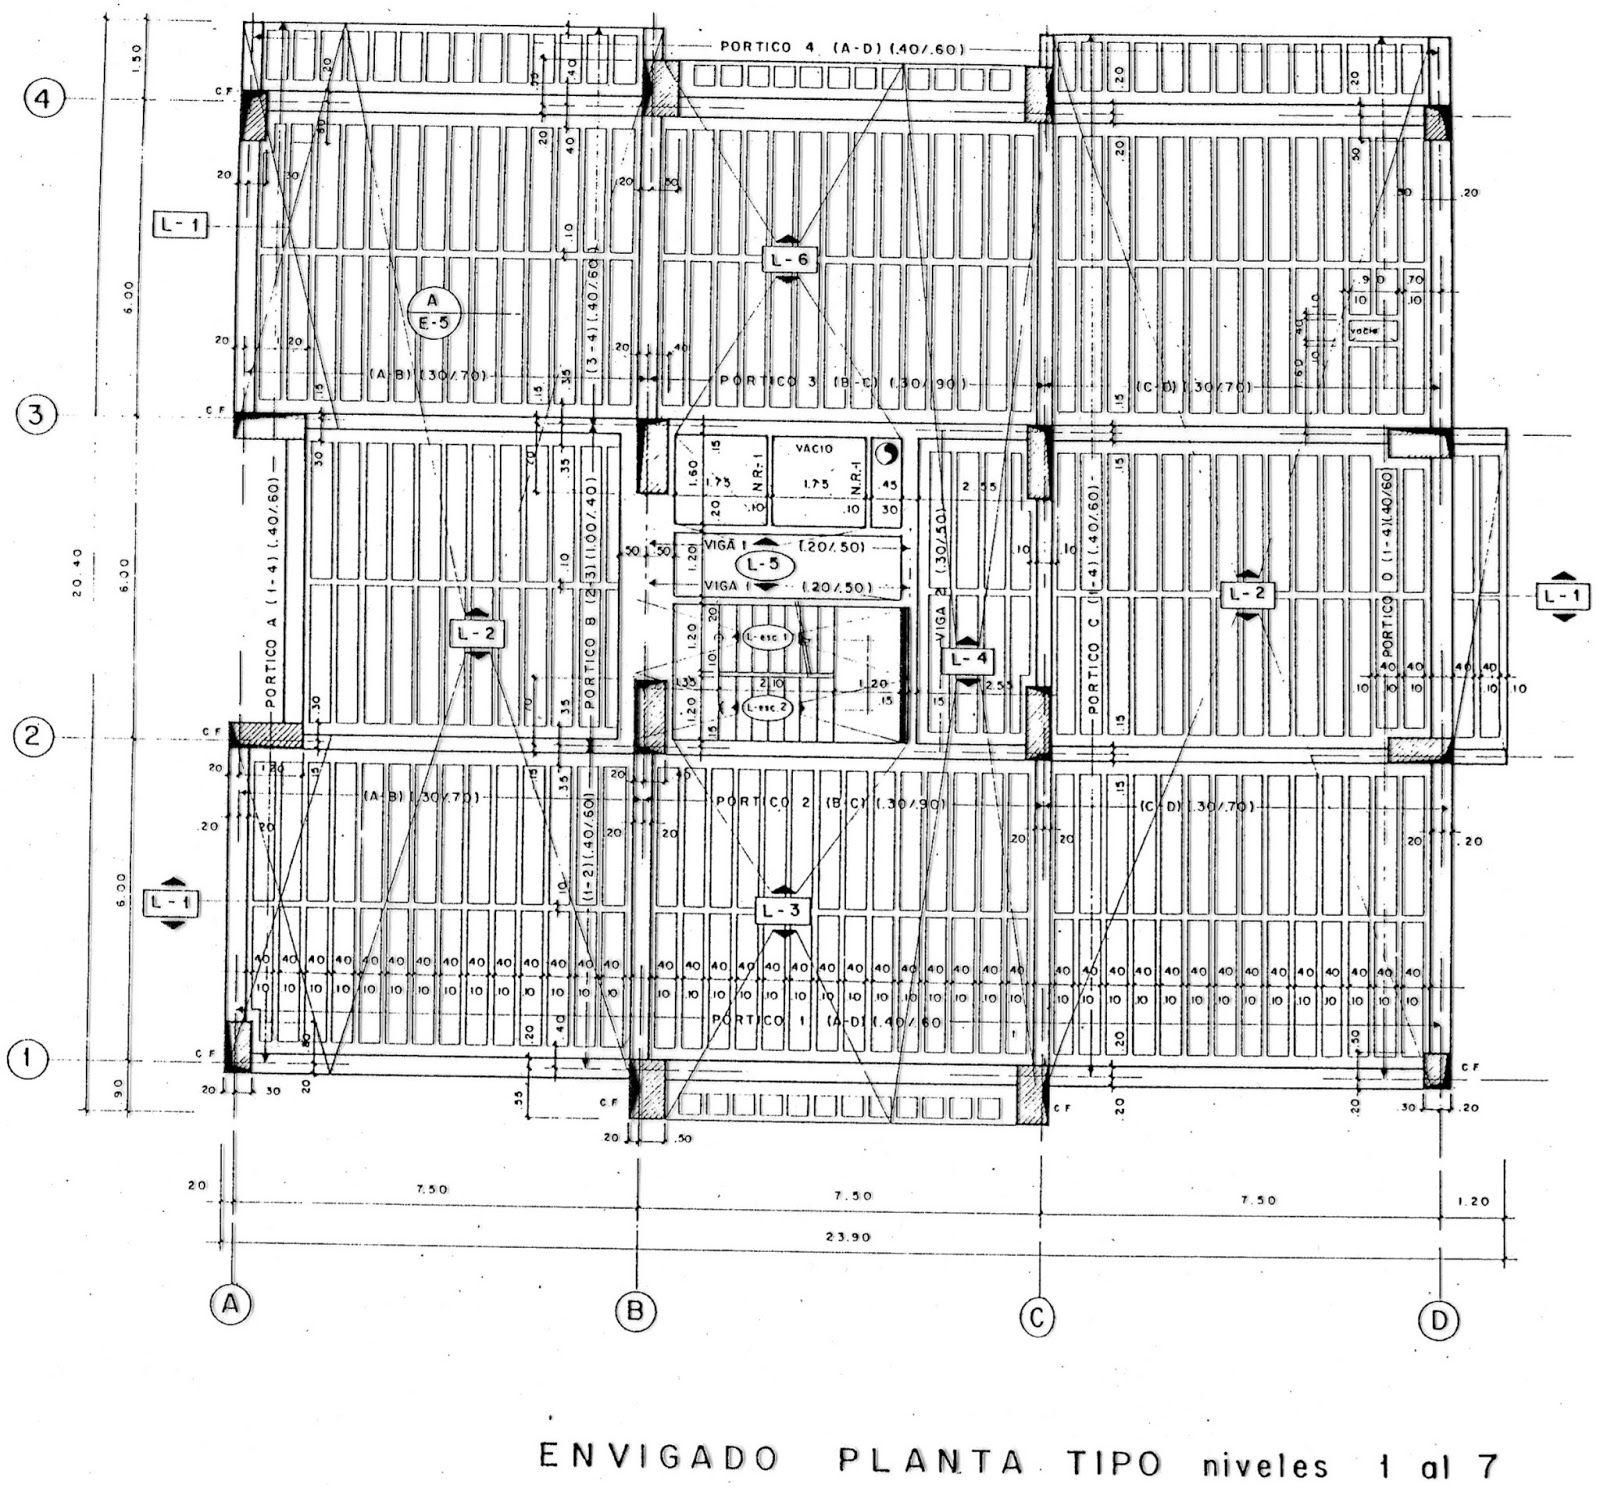 Ingenieria practica del ingeniero adolfo nasato detalles for Planos ingenieria civil